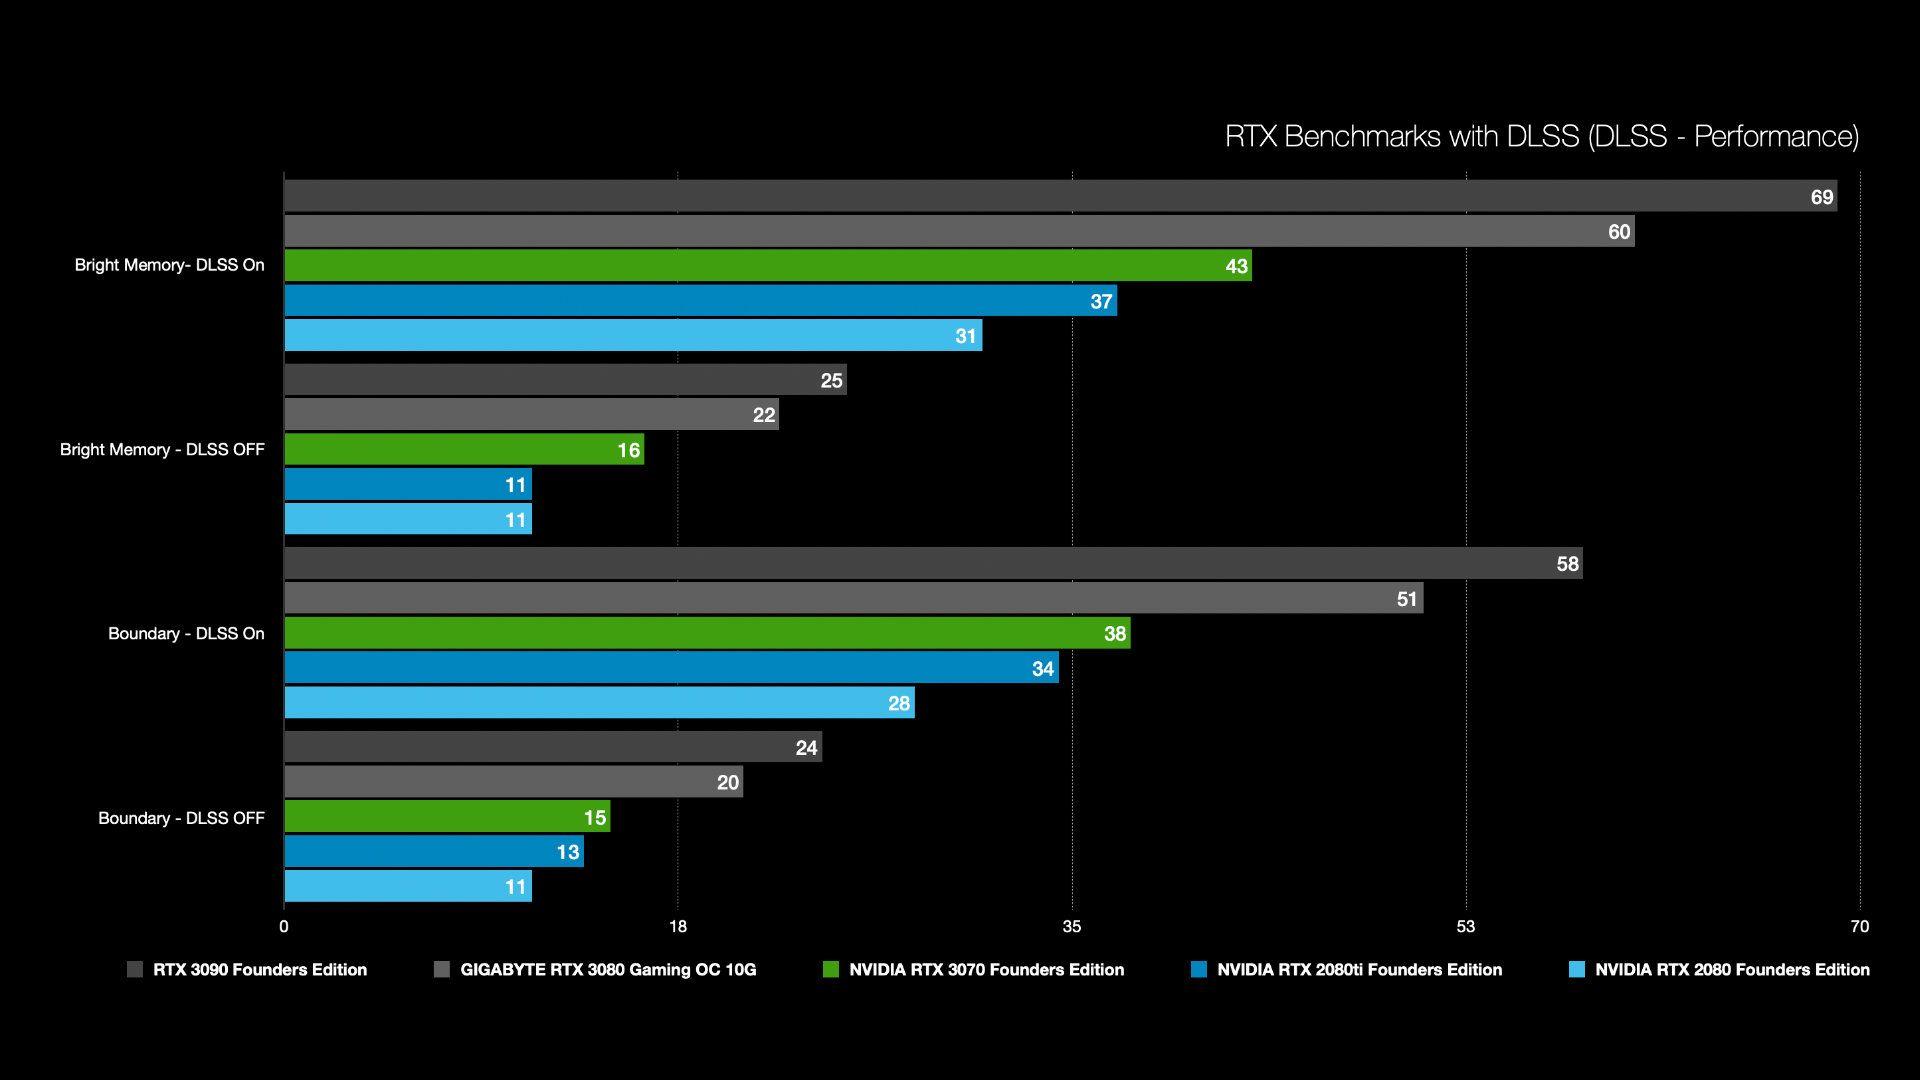 1440p RTX Performance